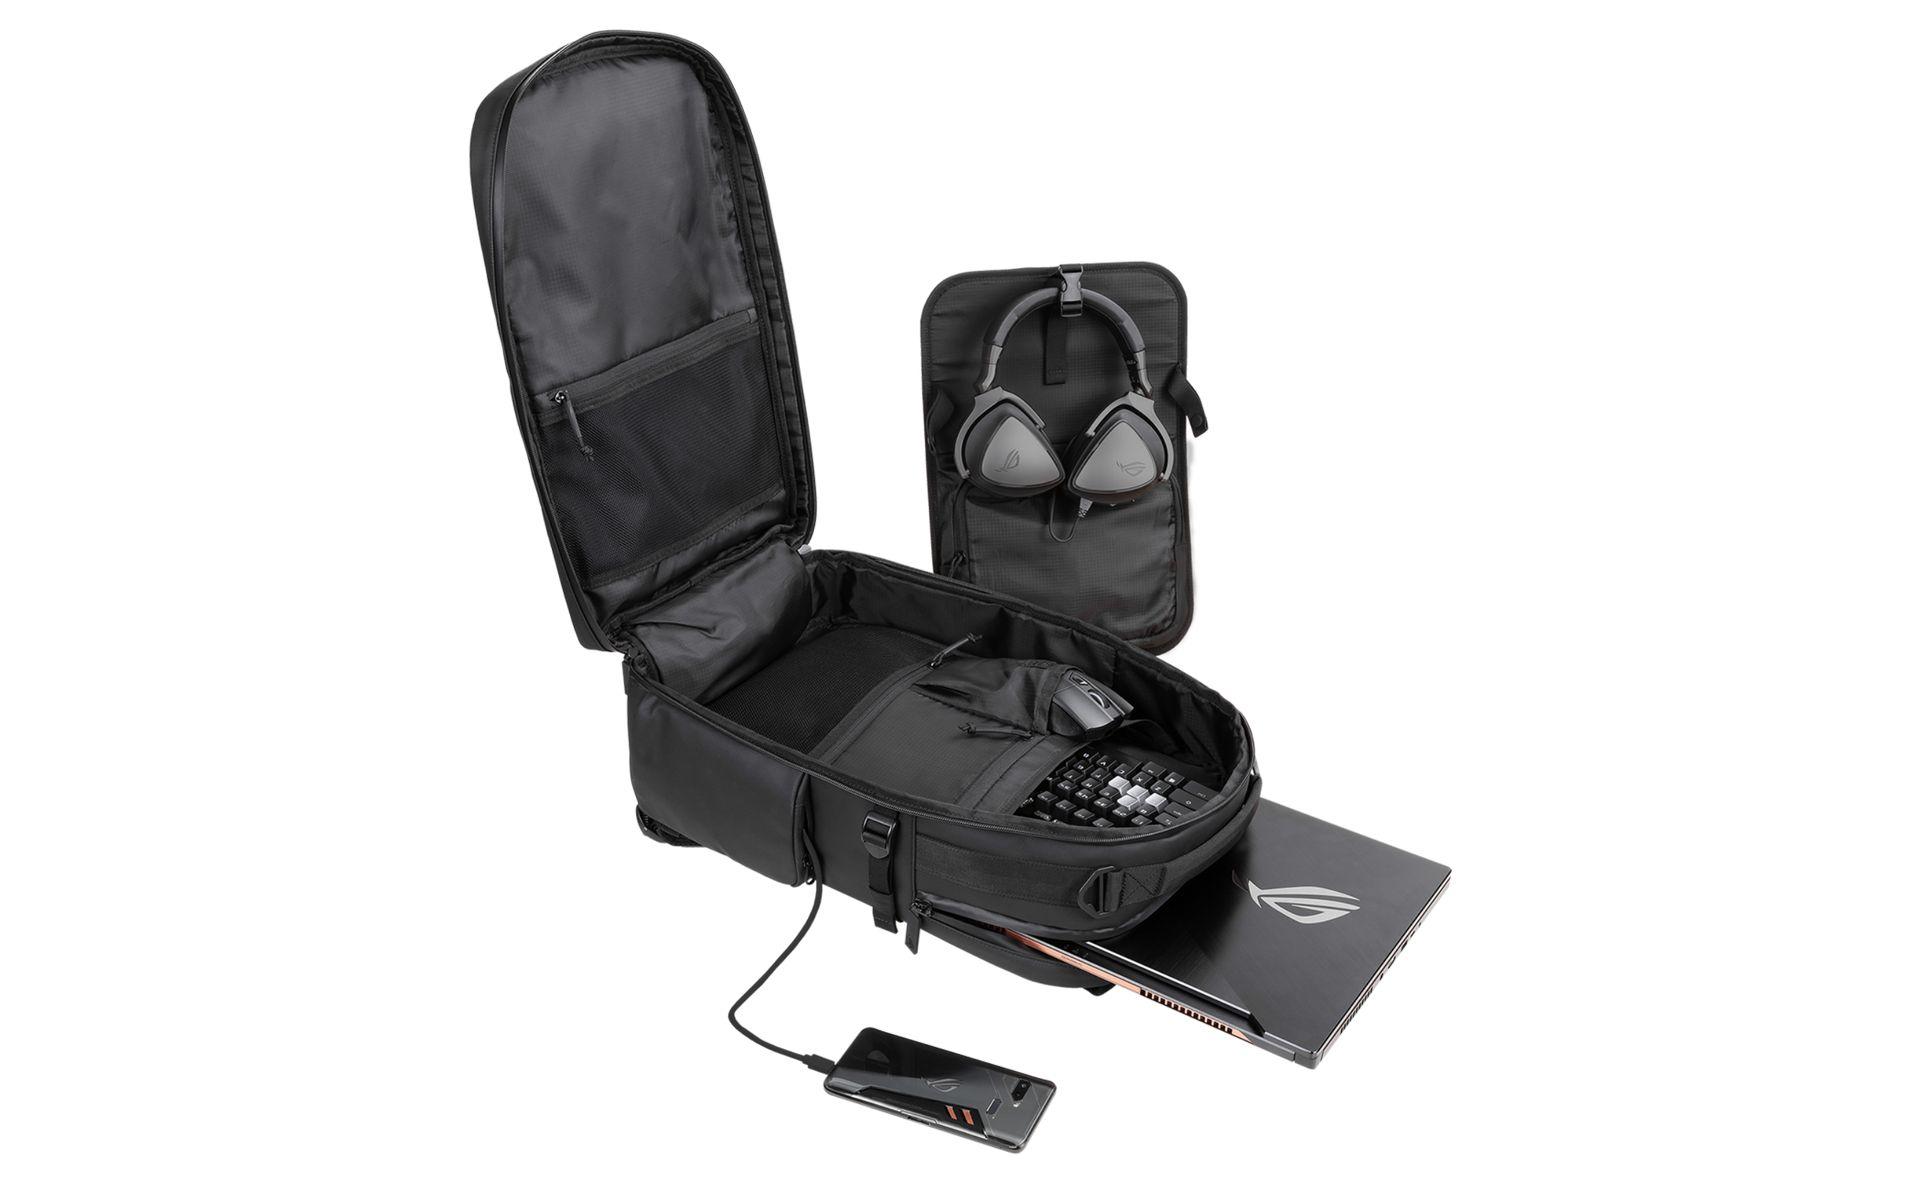 Balo ASUS ROG Ranger BP3703 Gaming Backpack